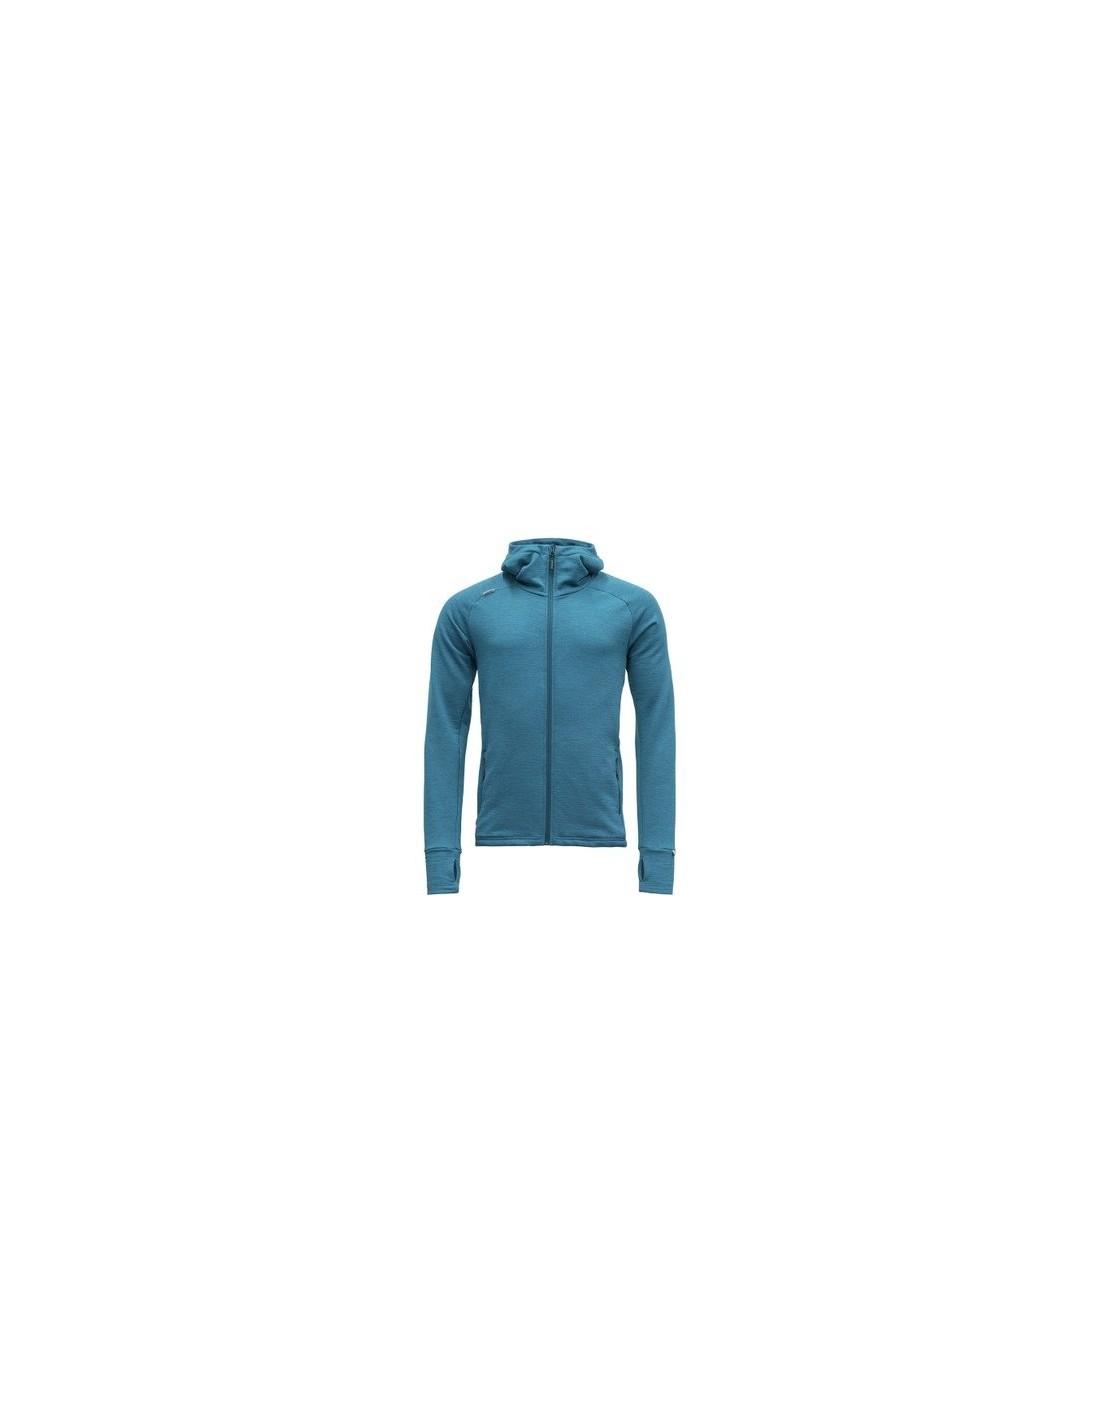 Ull Herrer Devold Nibba Jacket w/Hood Herre GO 264 450 A 1,499.00